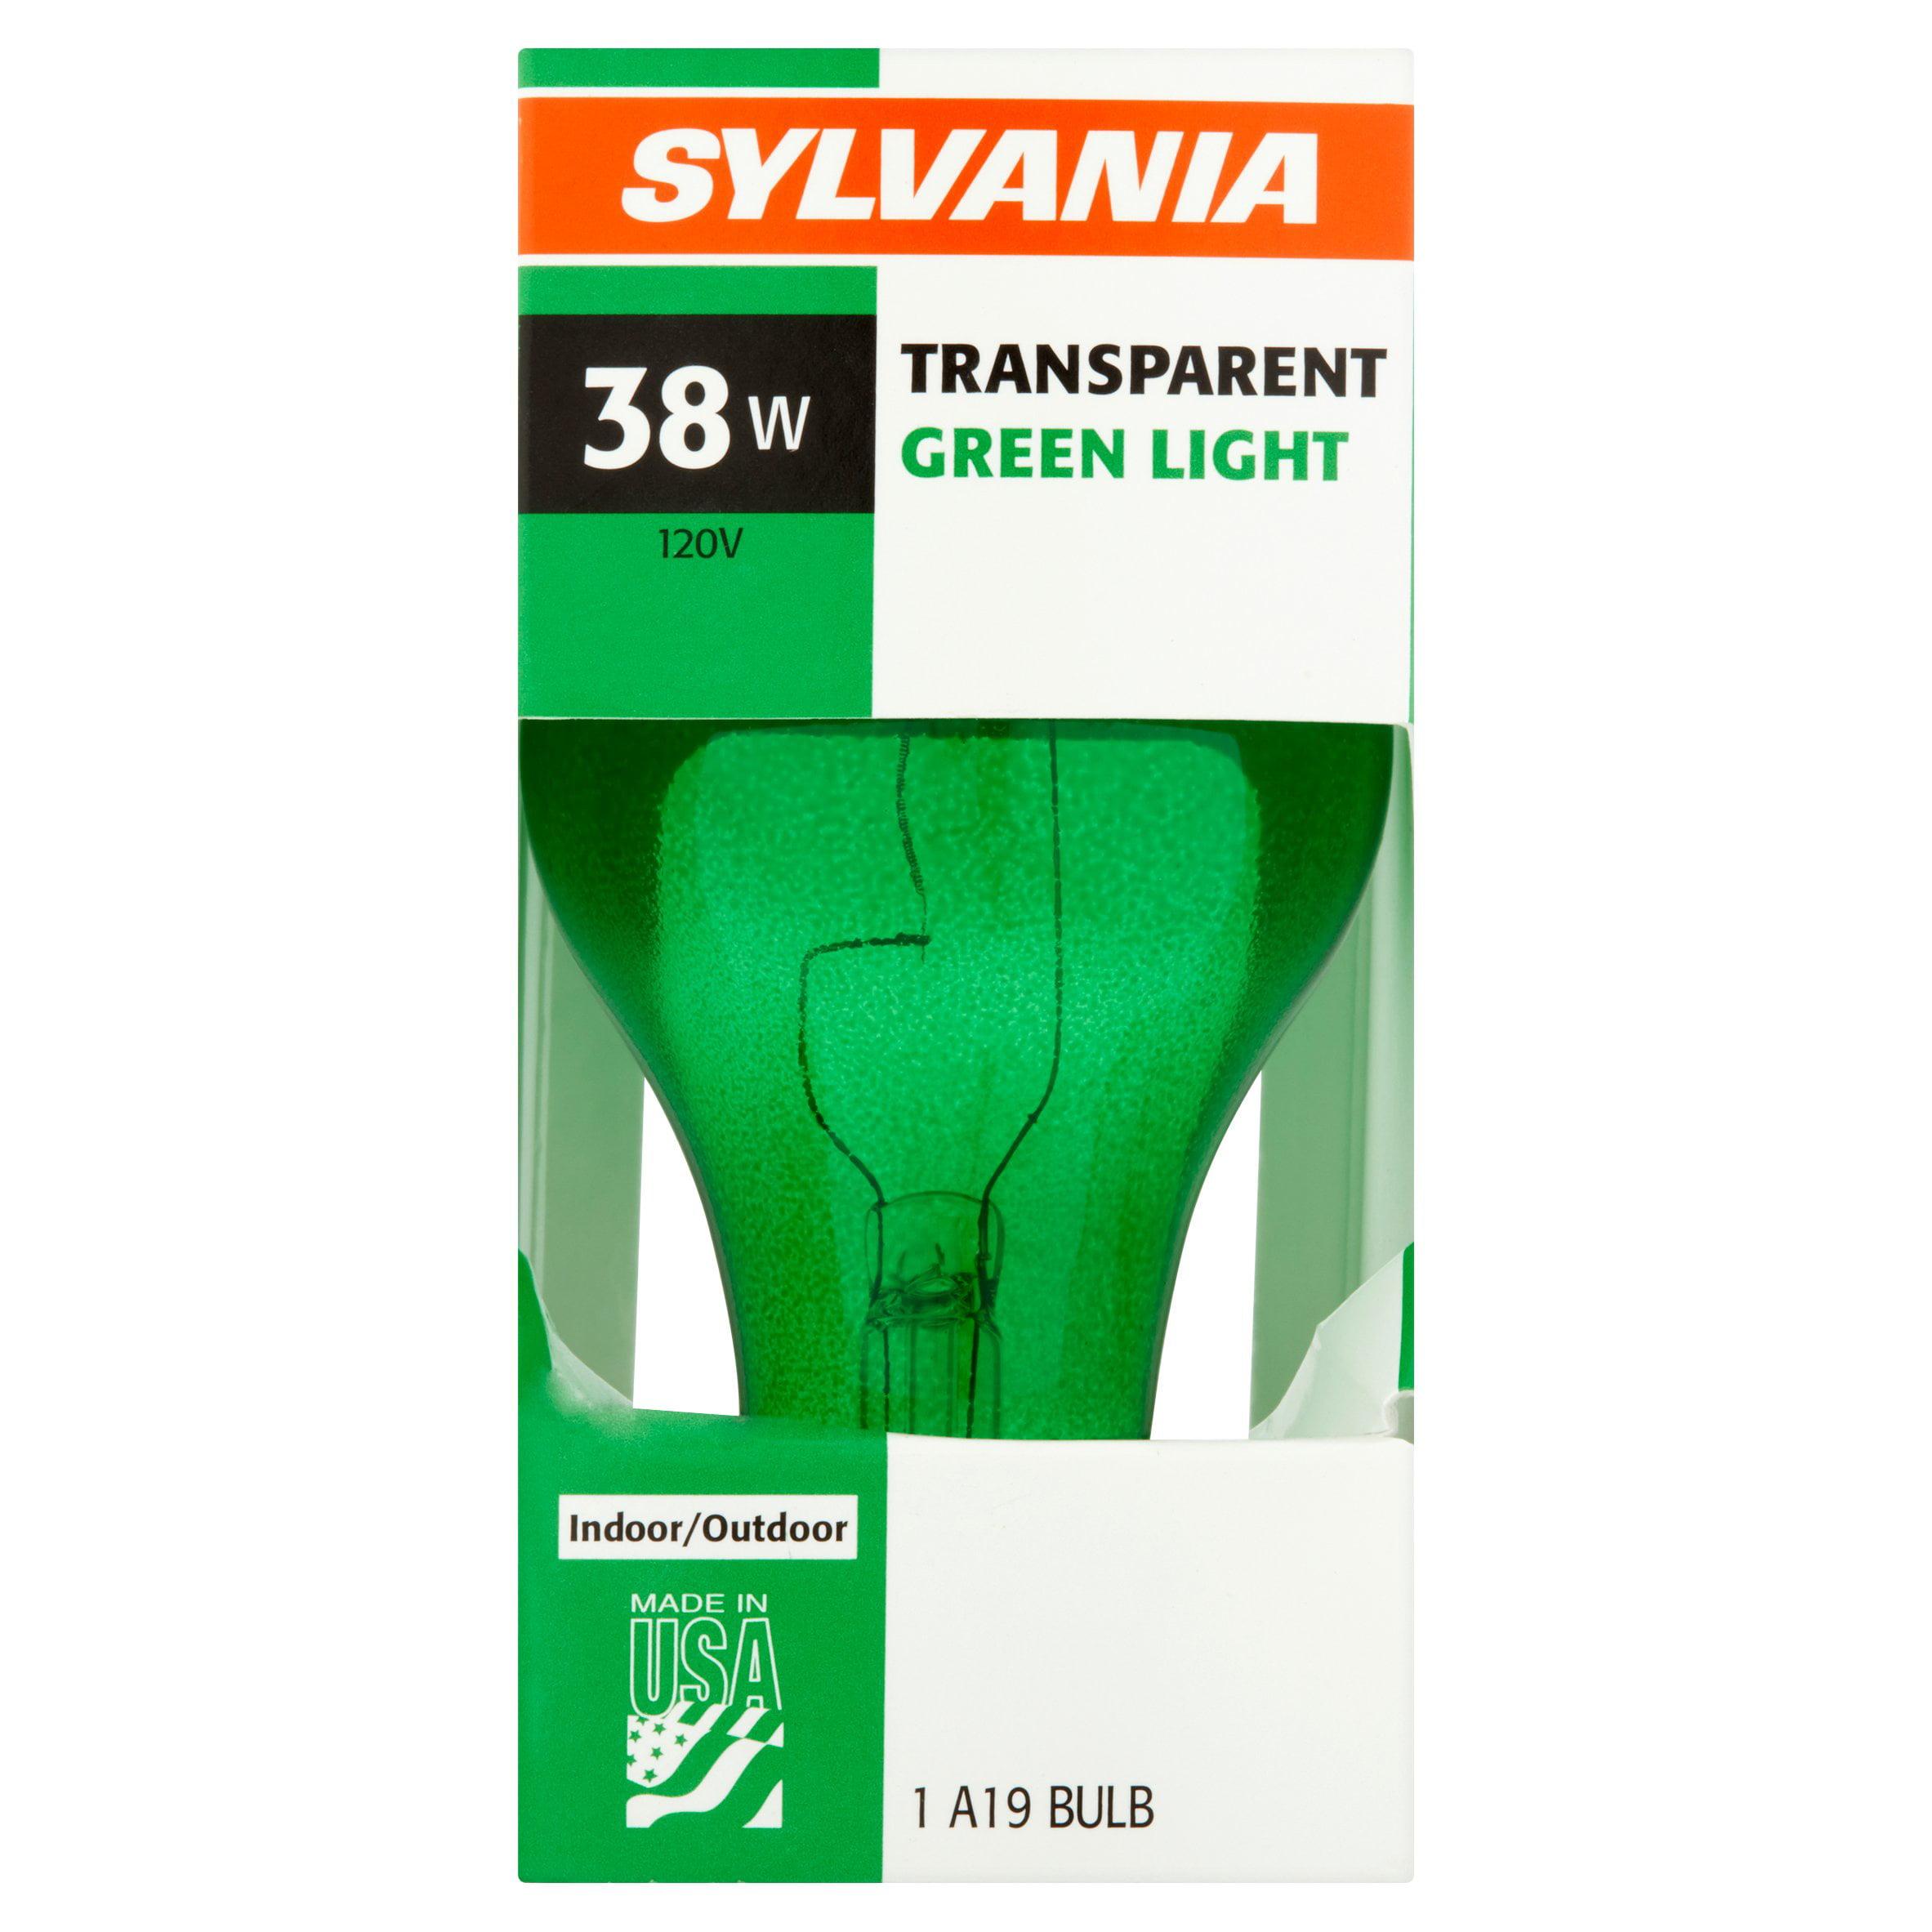 Sylvania Light Bulb, 38W, Transparent Green